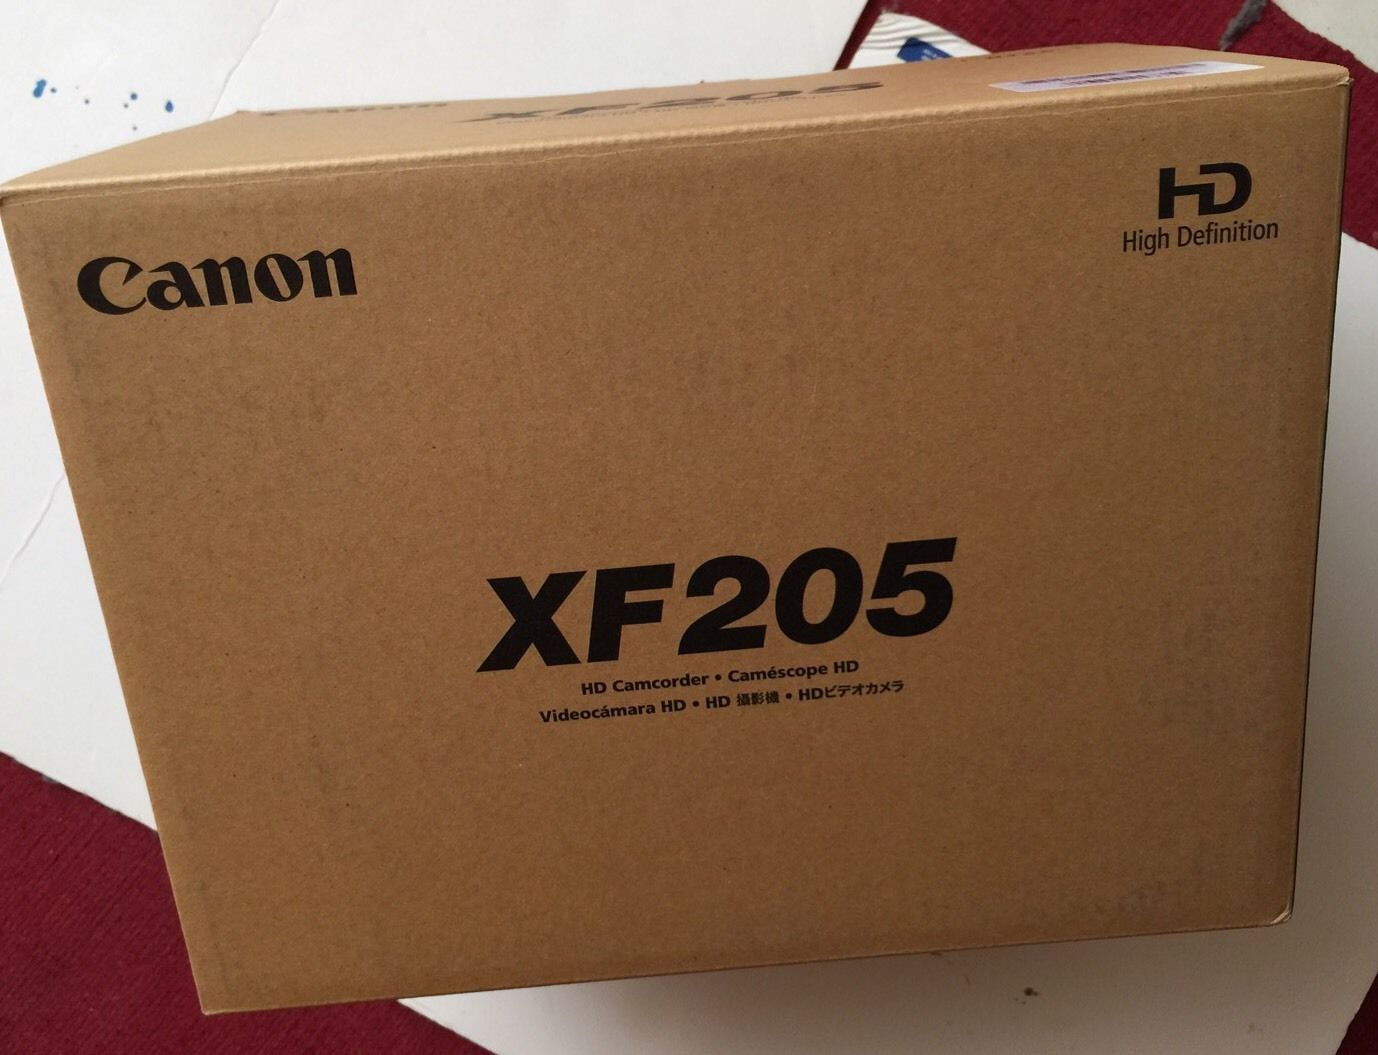 Canon XF205 Camcorder